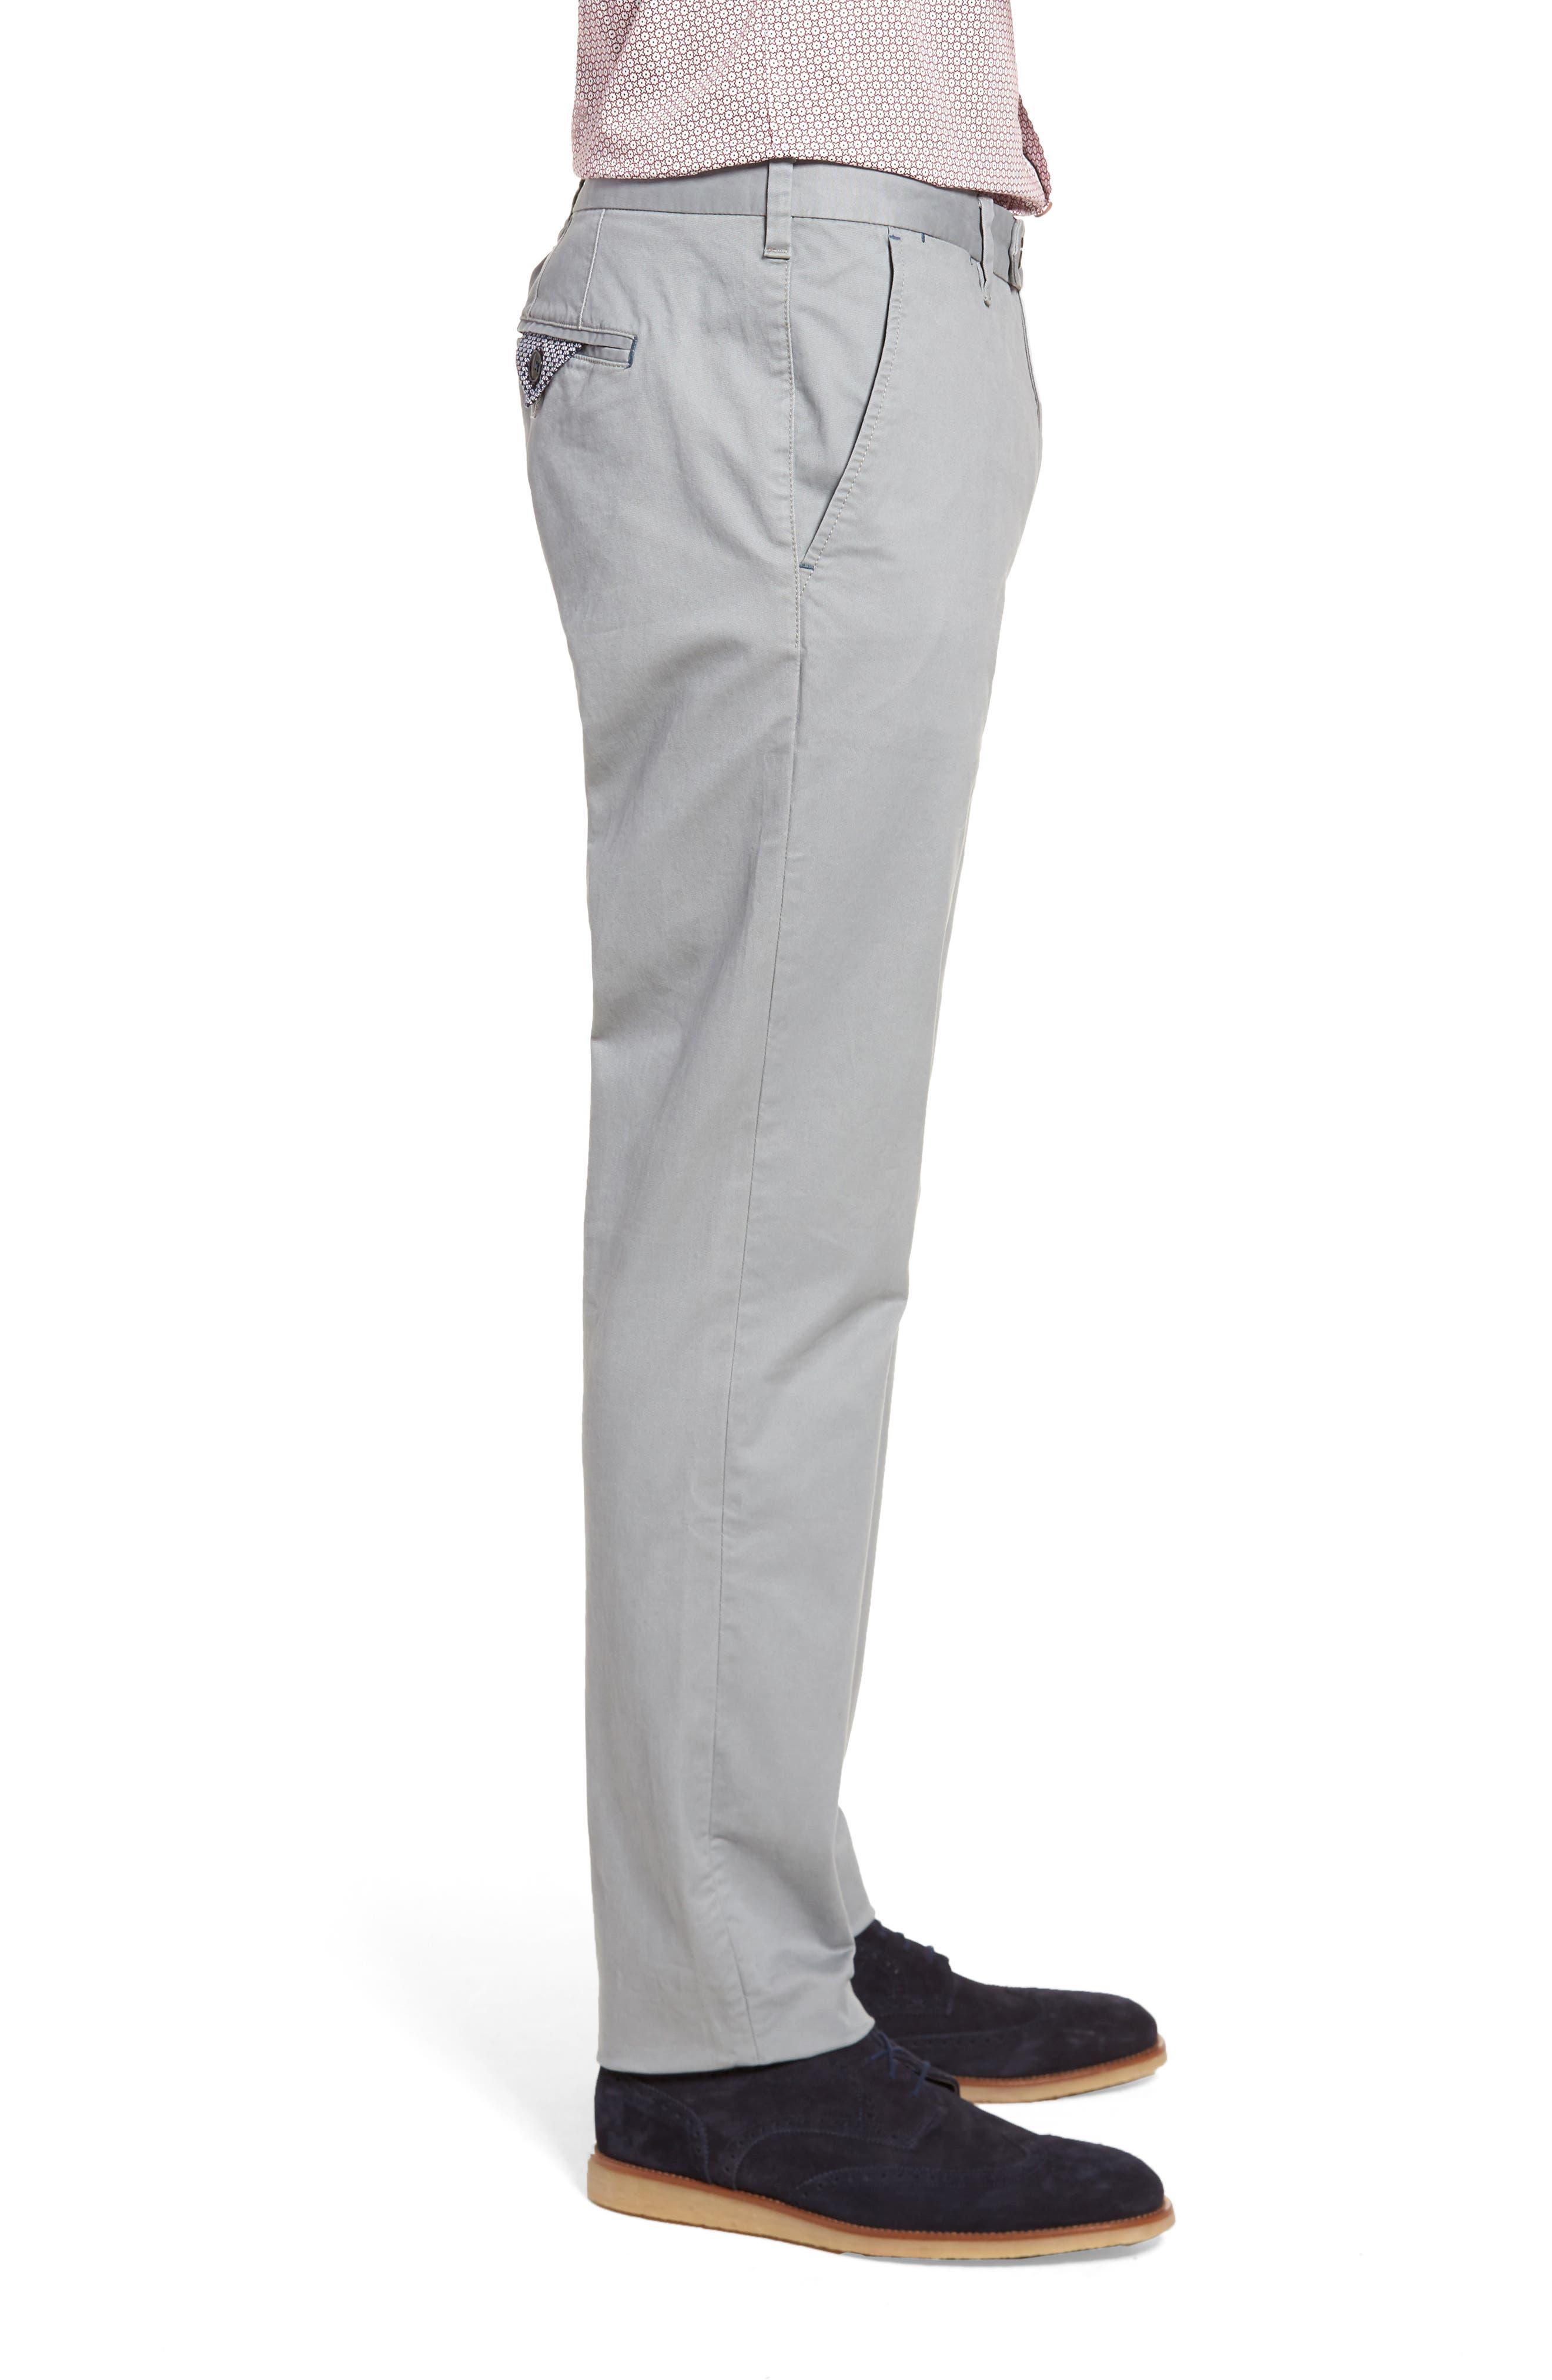 Proctt Flat Front Stretch Solid Cotton Pants,                             Alternate thumbnail 3, color,                             Light Grey